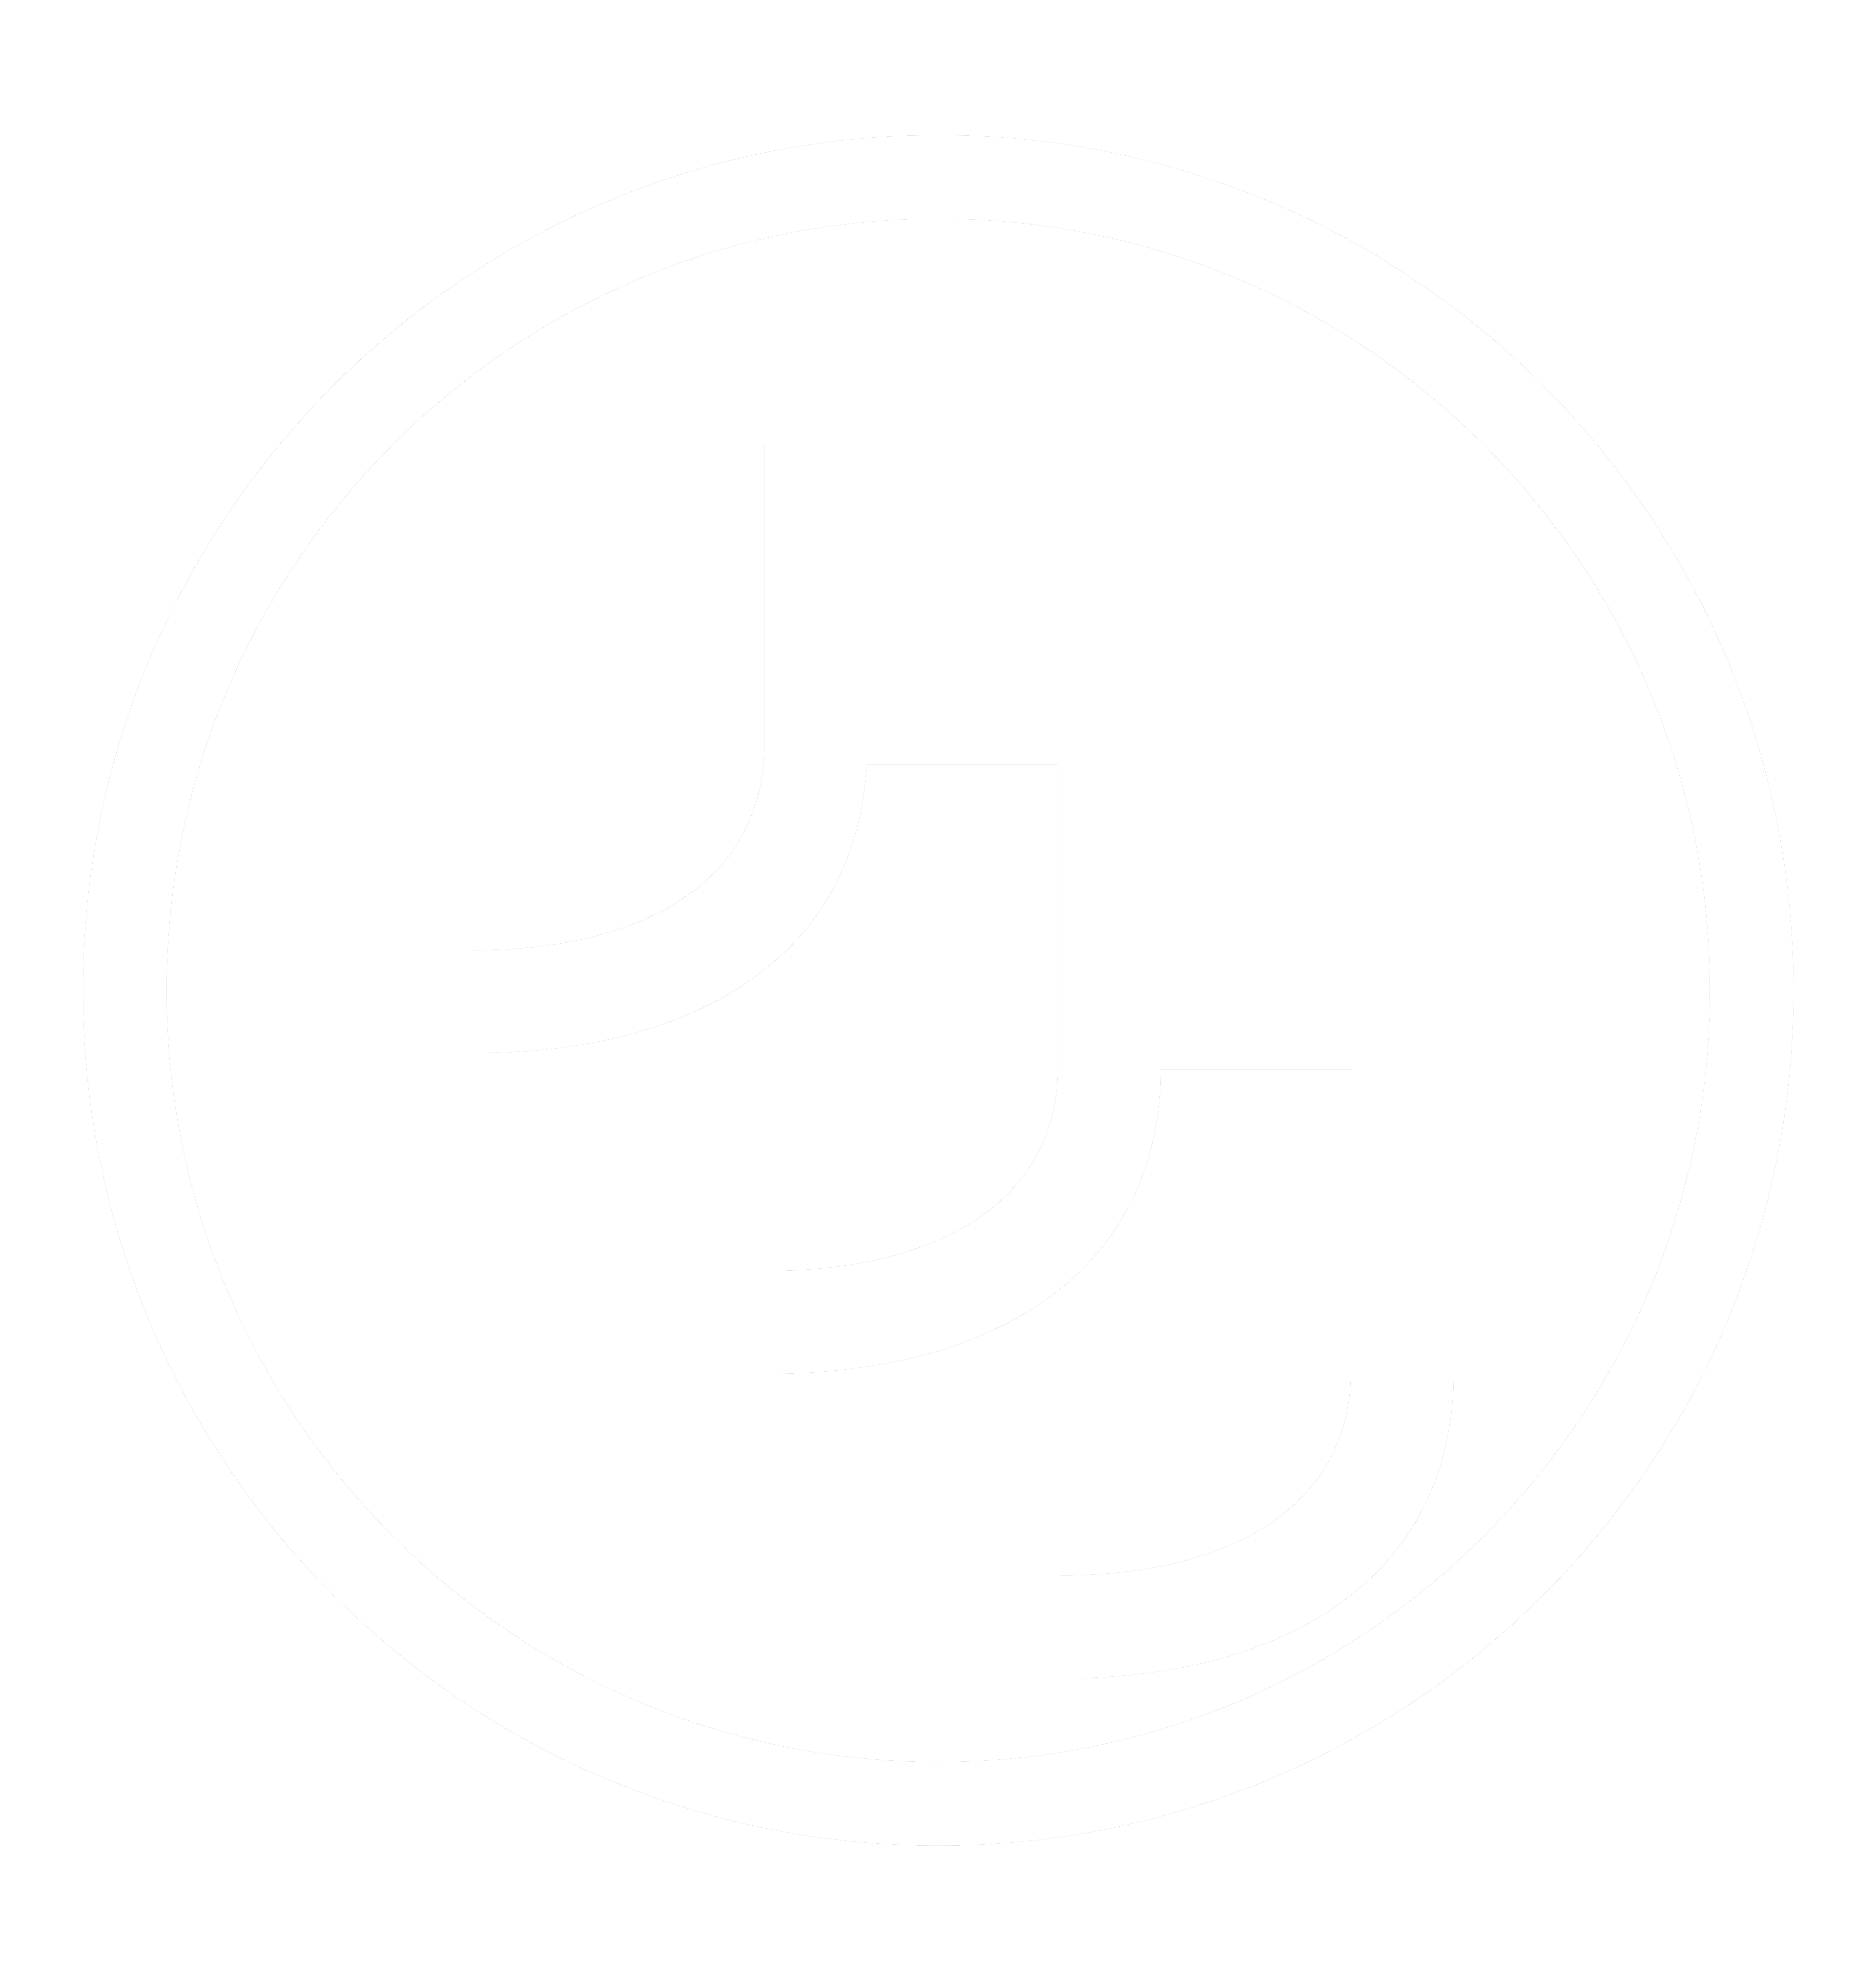 Triple-J Media